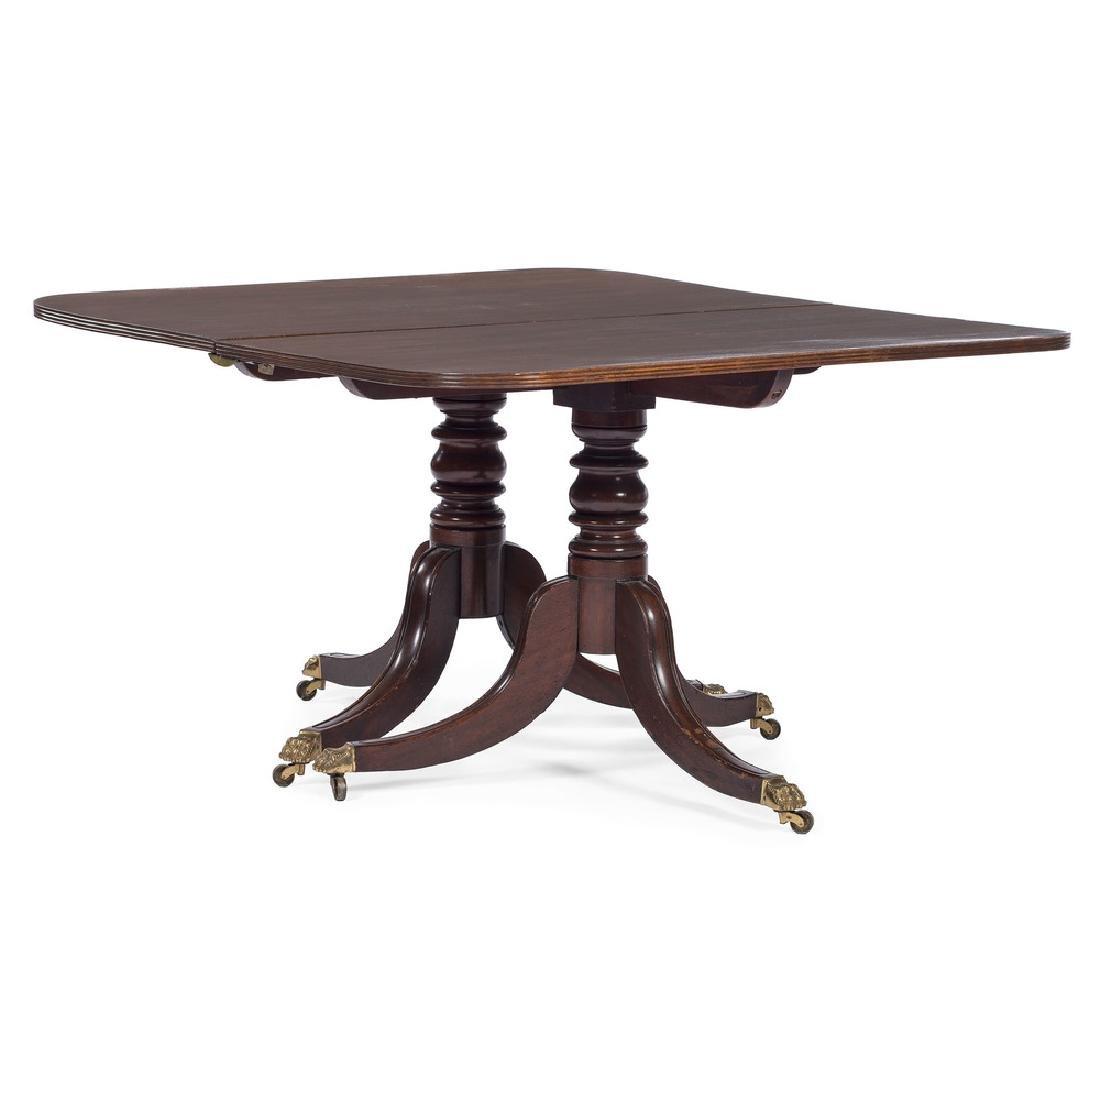 George III Pedestal Dining Table